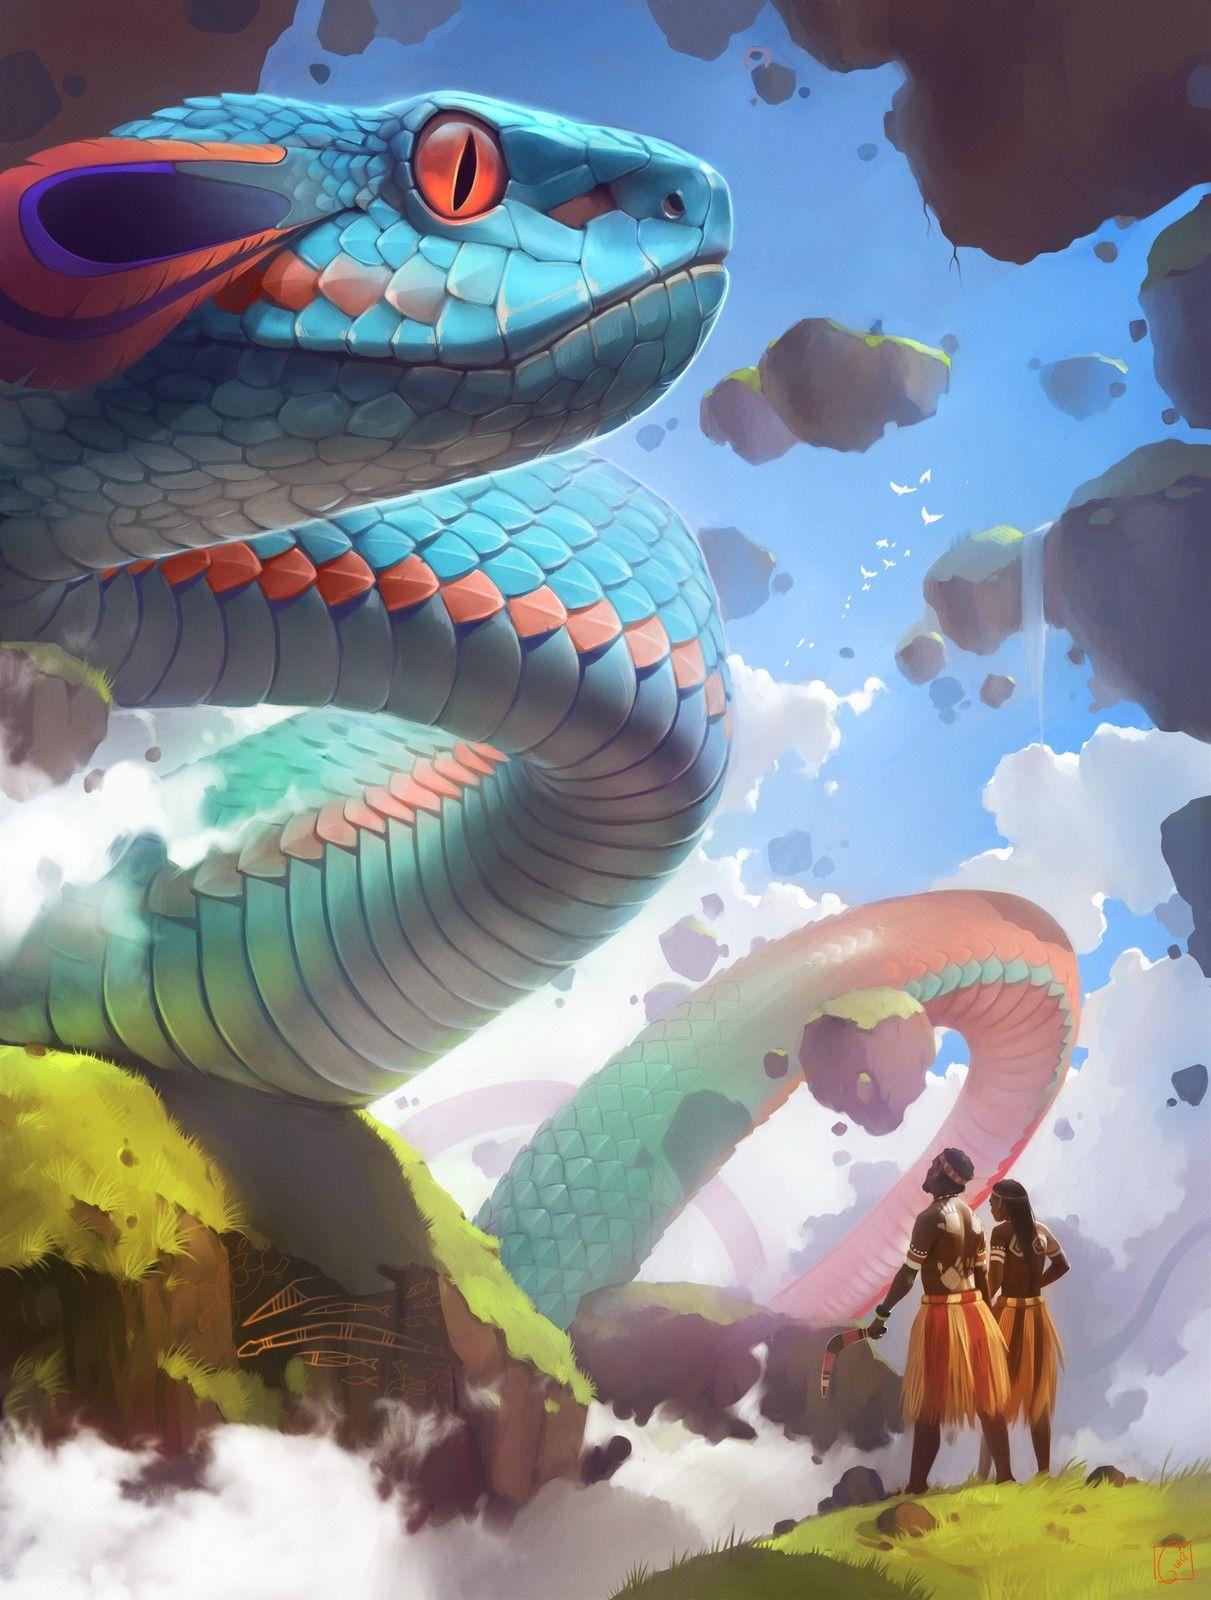 Rainbow Serpent Alexandra Gaudibuendia Khitrova On Artstation At